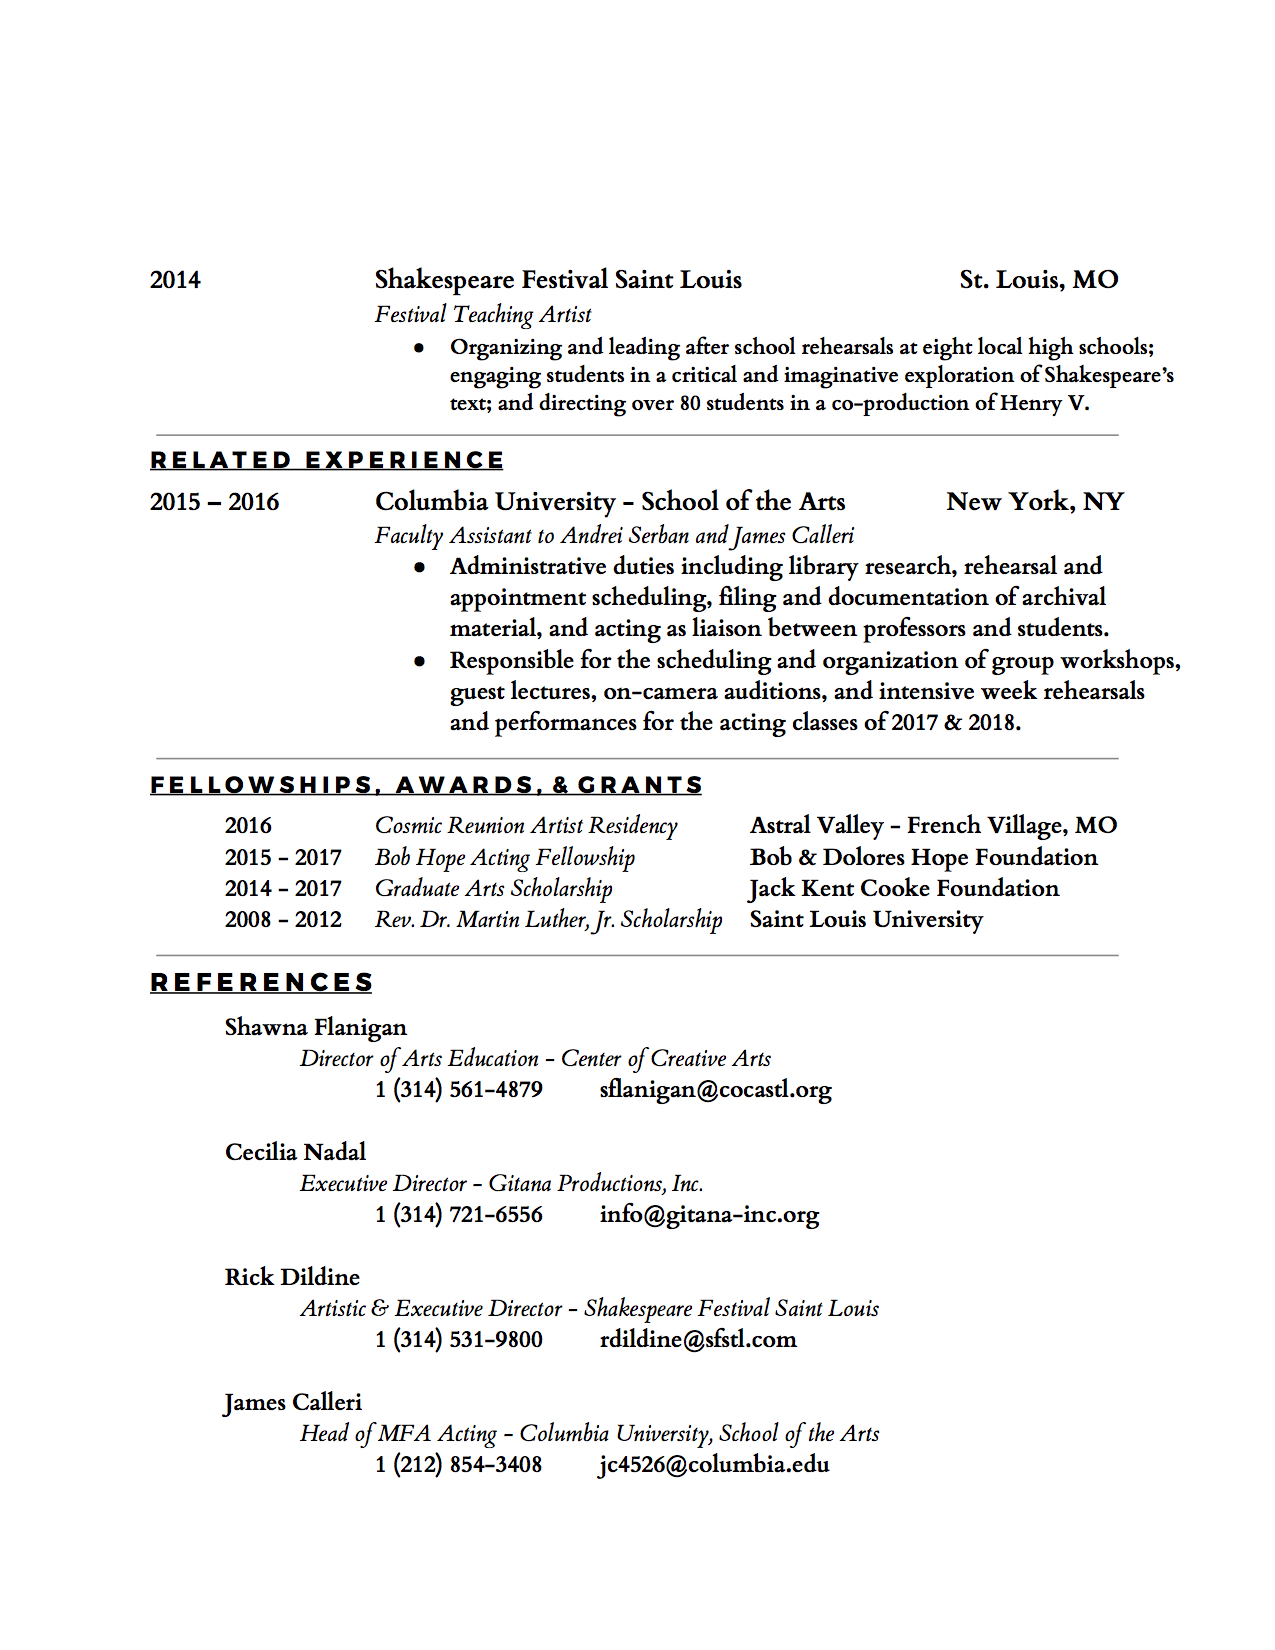 CuellarTeachingResume (2)2.jpg